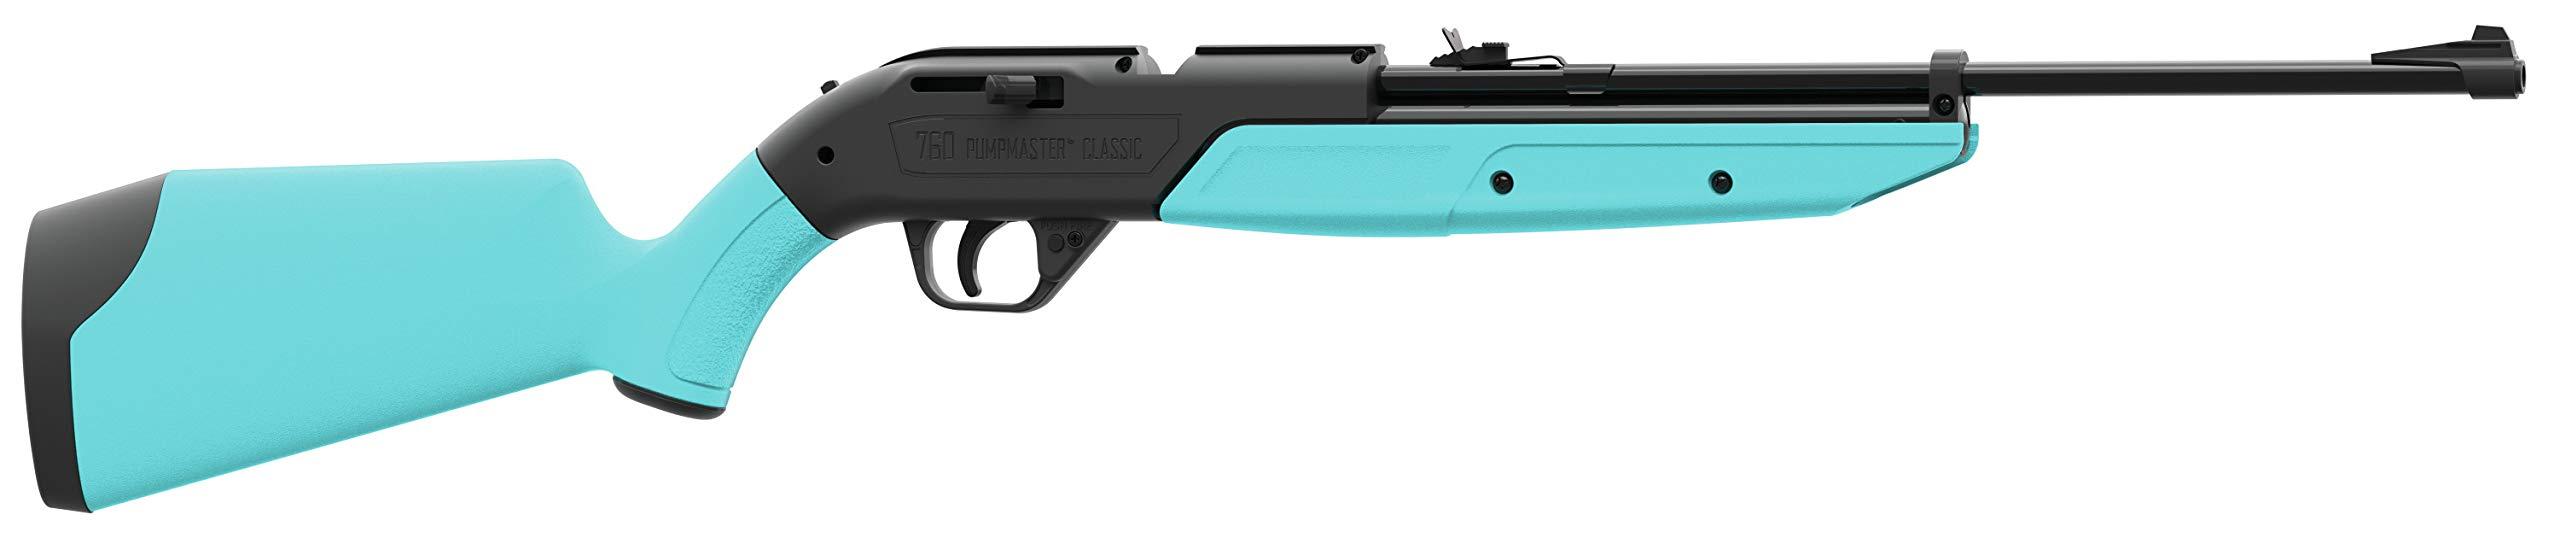 Crosman 760LB 760 Pumpmaster .177 Pellet/BB Pneumatic Pump Air Rifle, Blue by Crosman